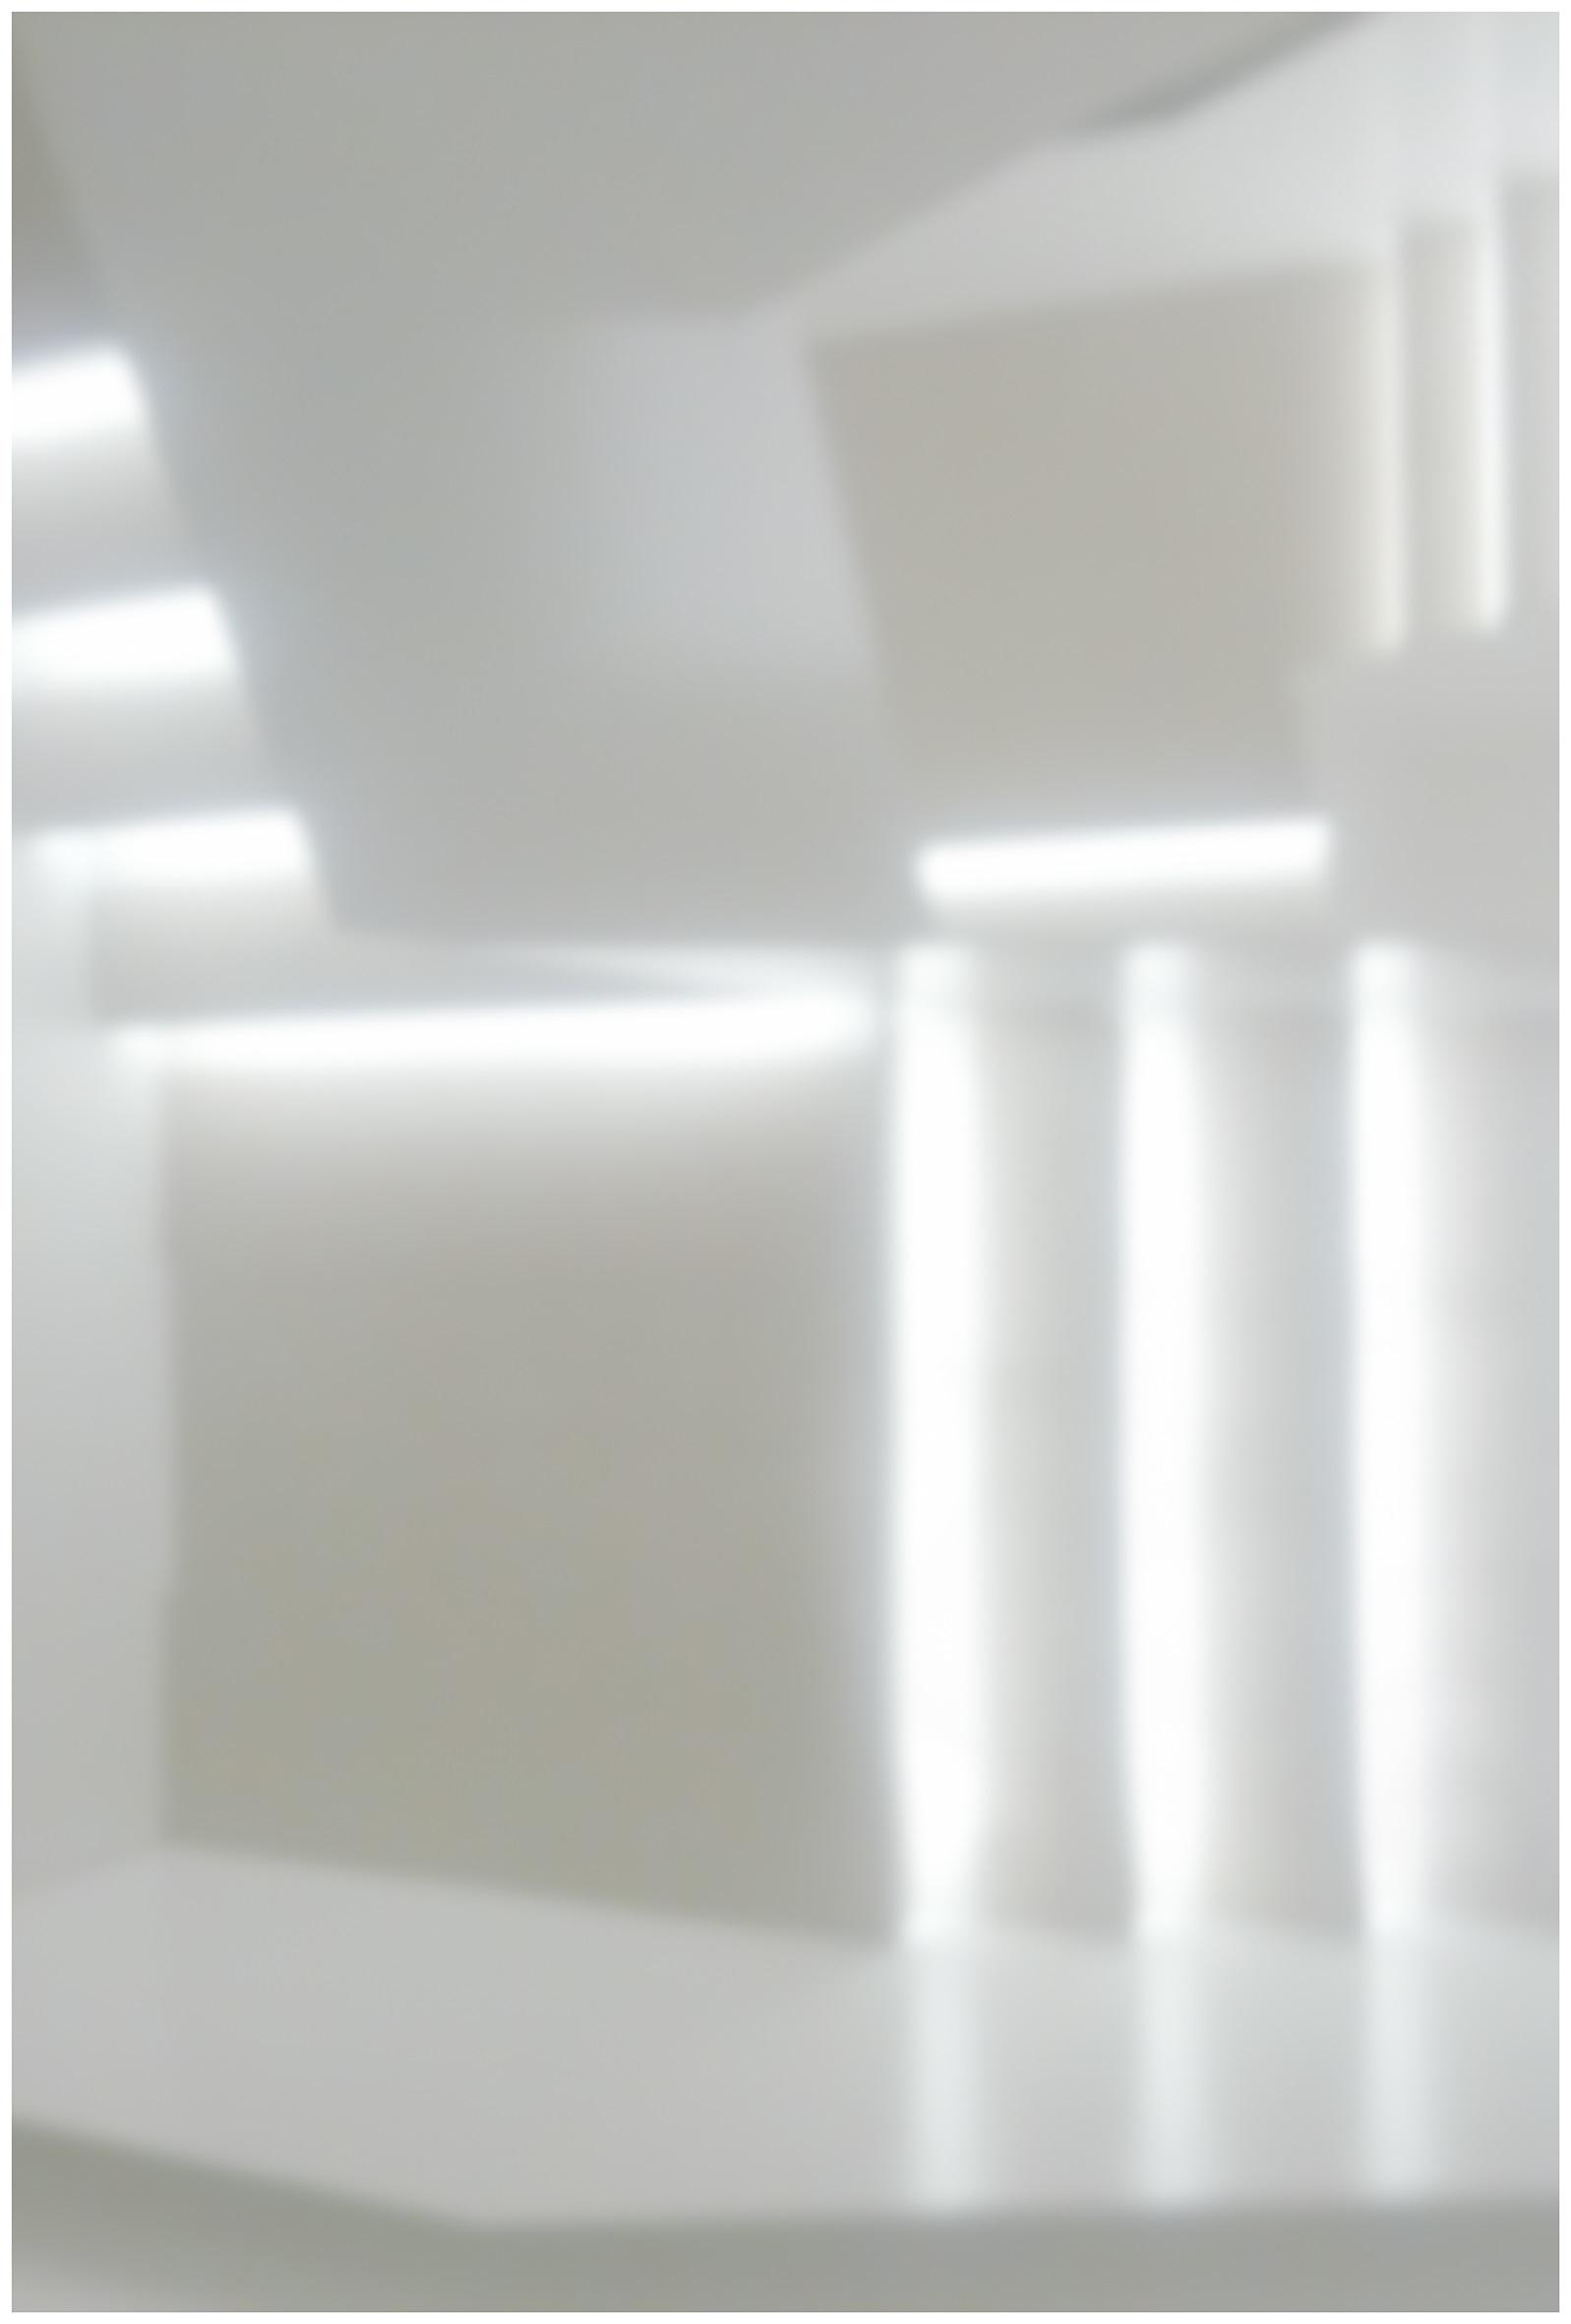 Eva Schlegel,  Untitled 217,  2015, Print on Hahnemuhle Butten, 79 1/2 x 53 3/4 inches (202 x 136.6 cm)